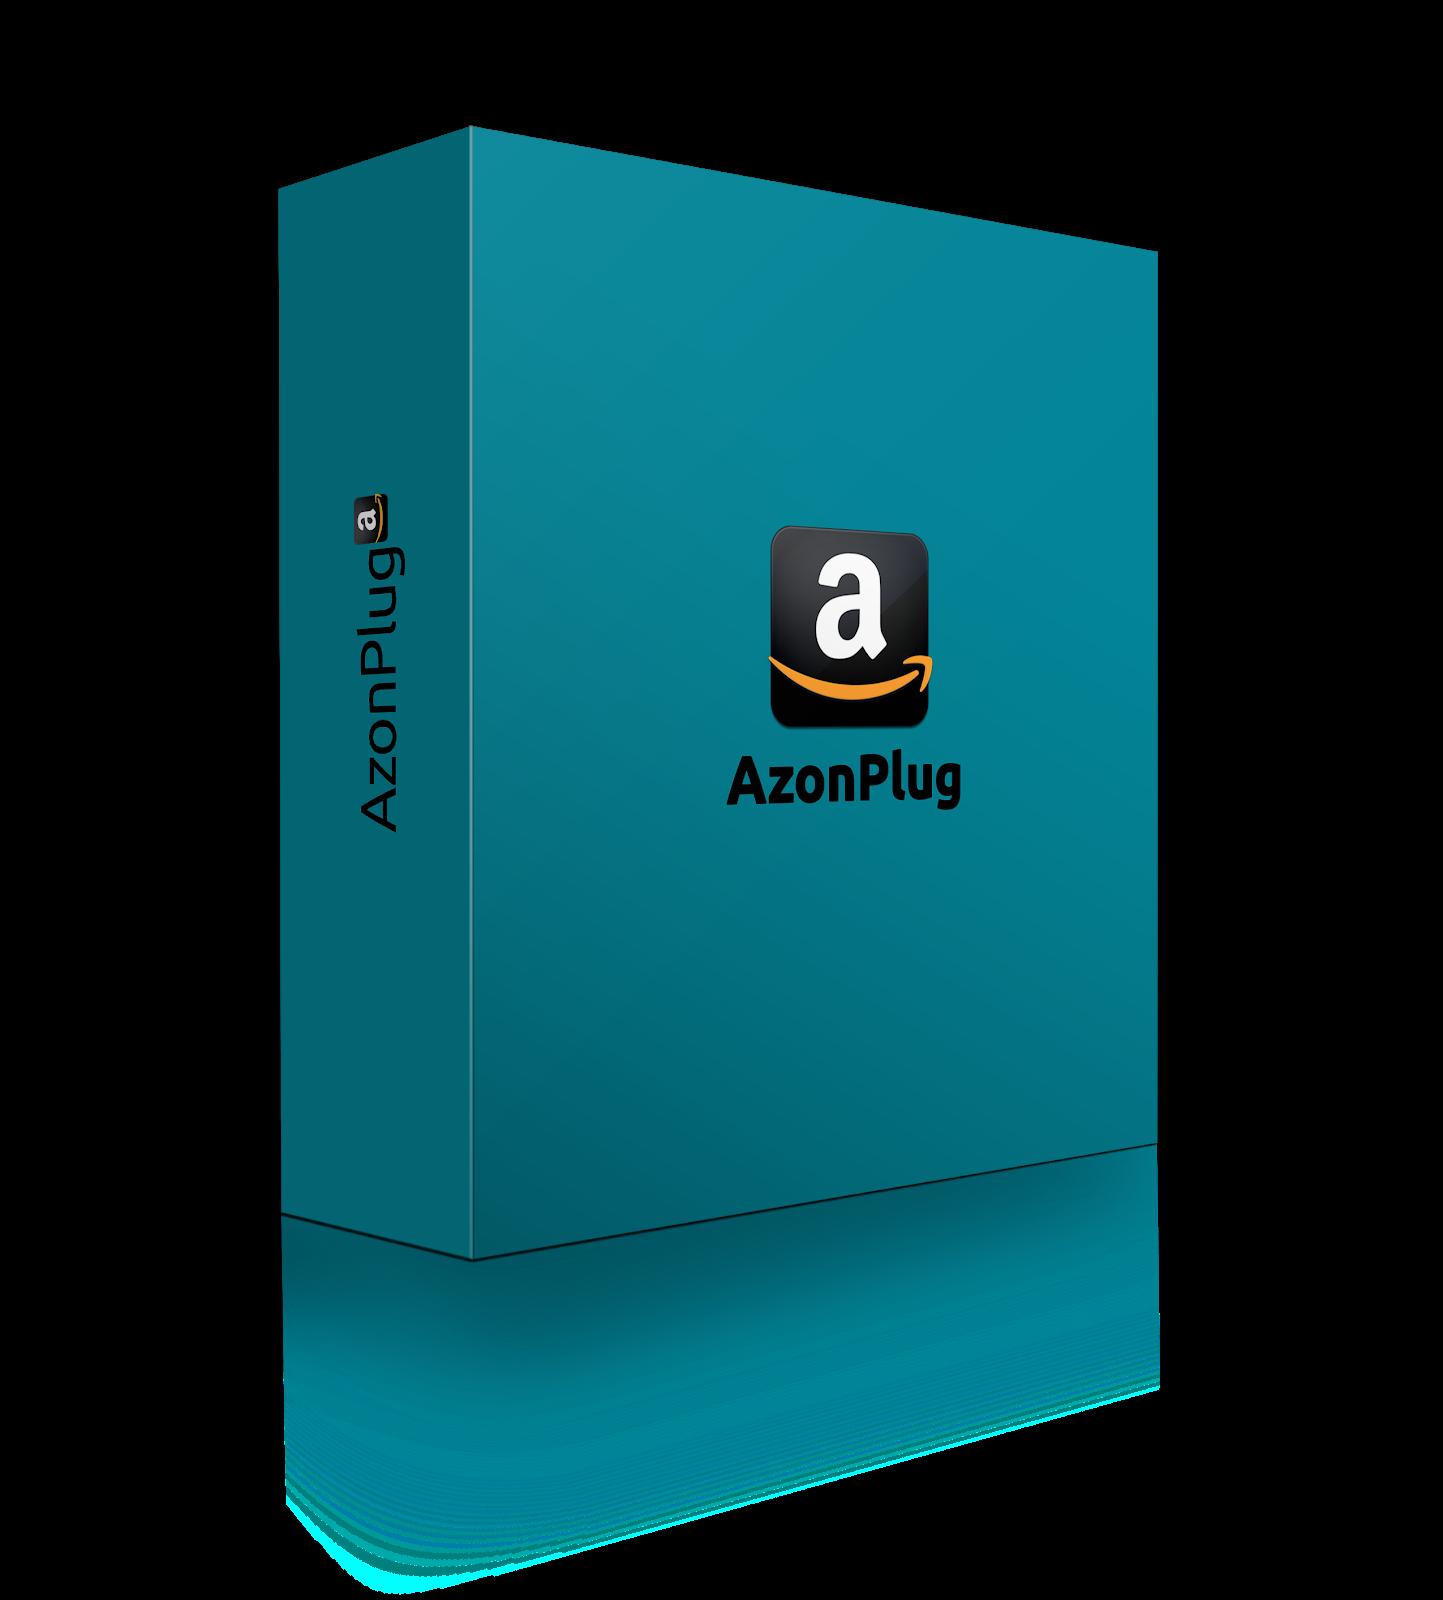 AzonPlug